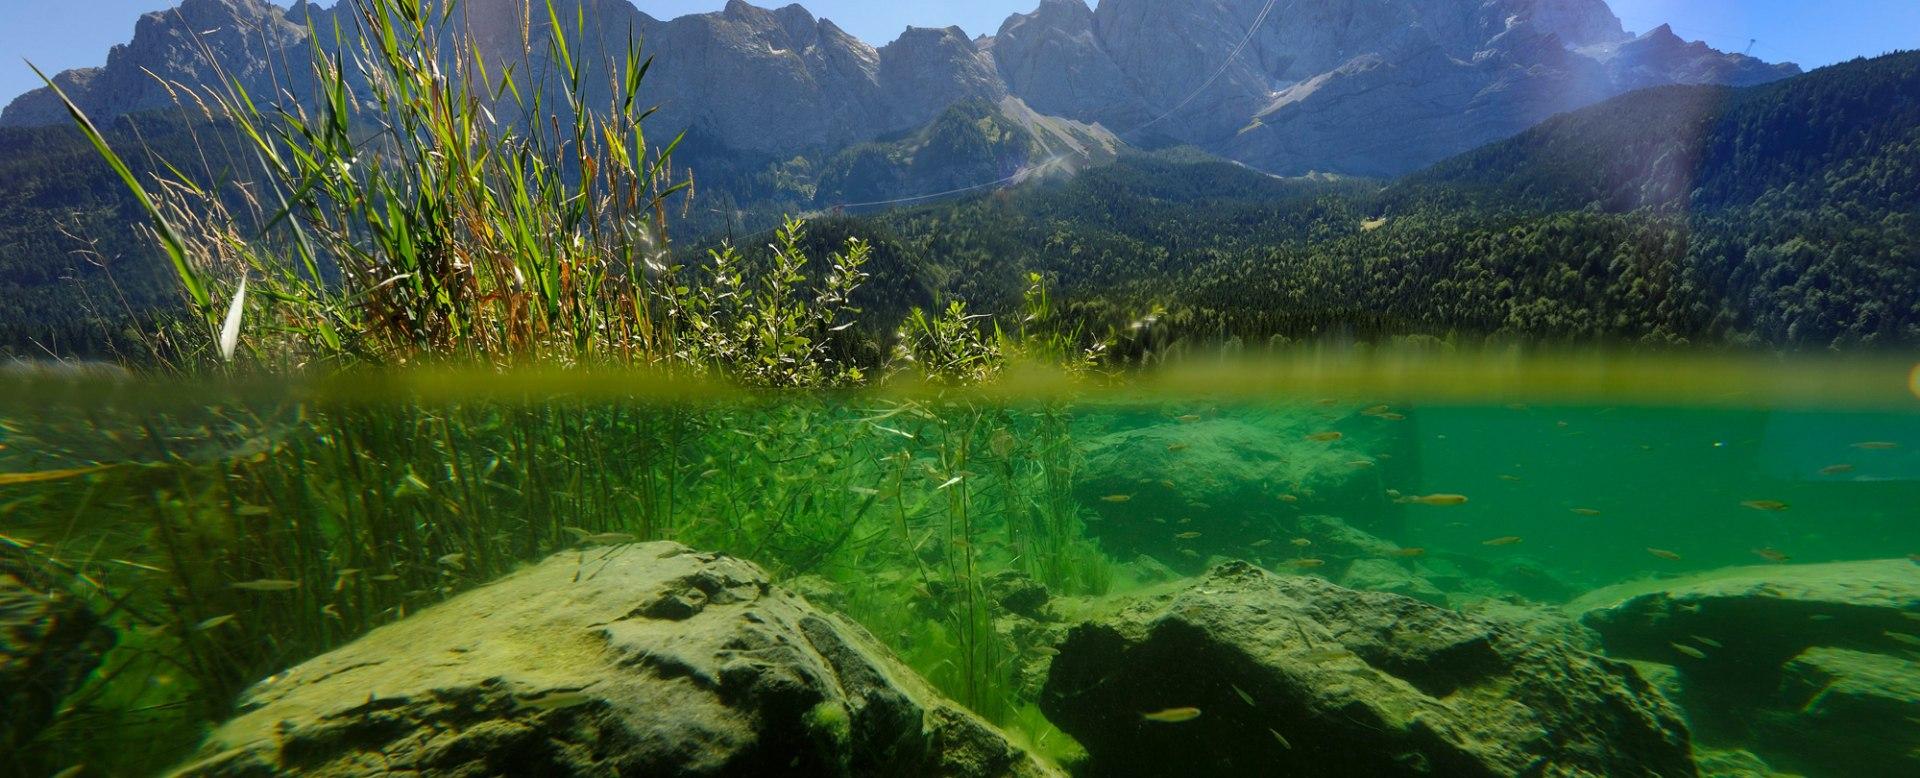 Lake Eibsee, © Touristinformation Grainau - Foto Ehn